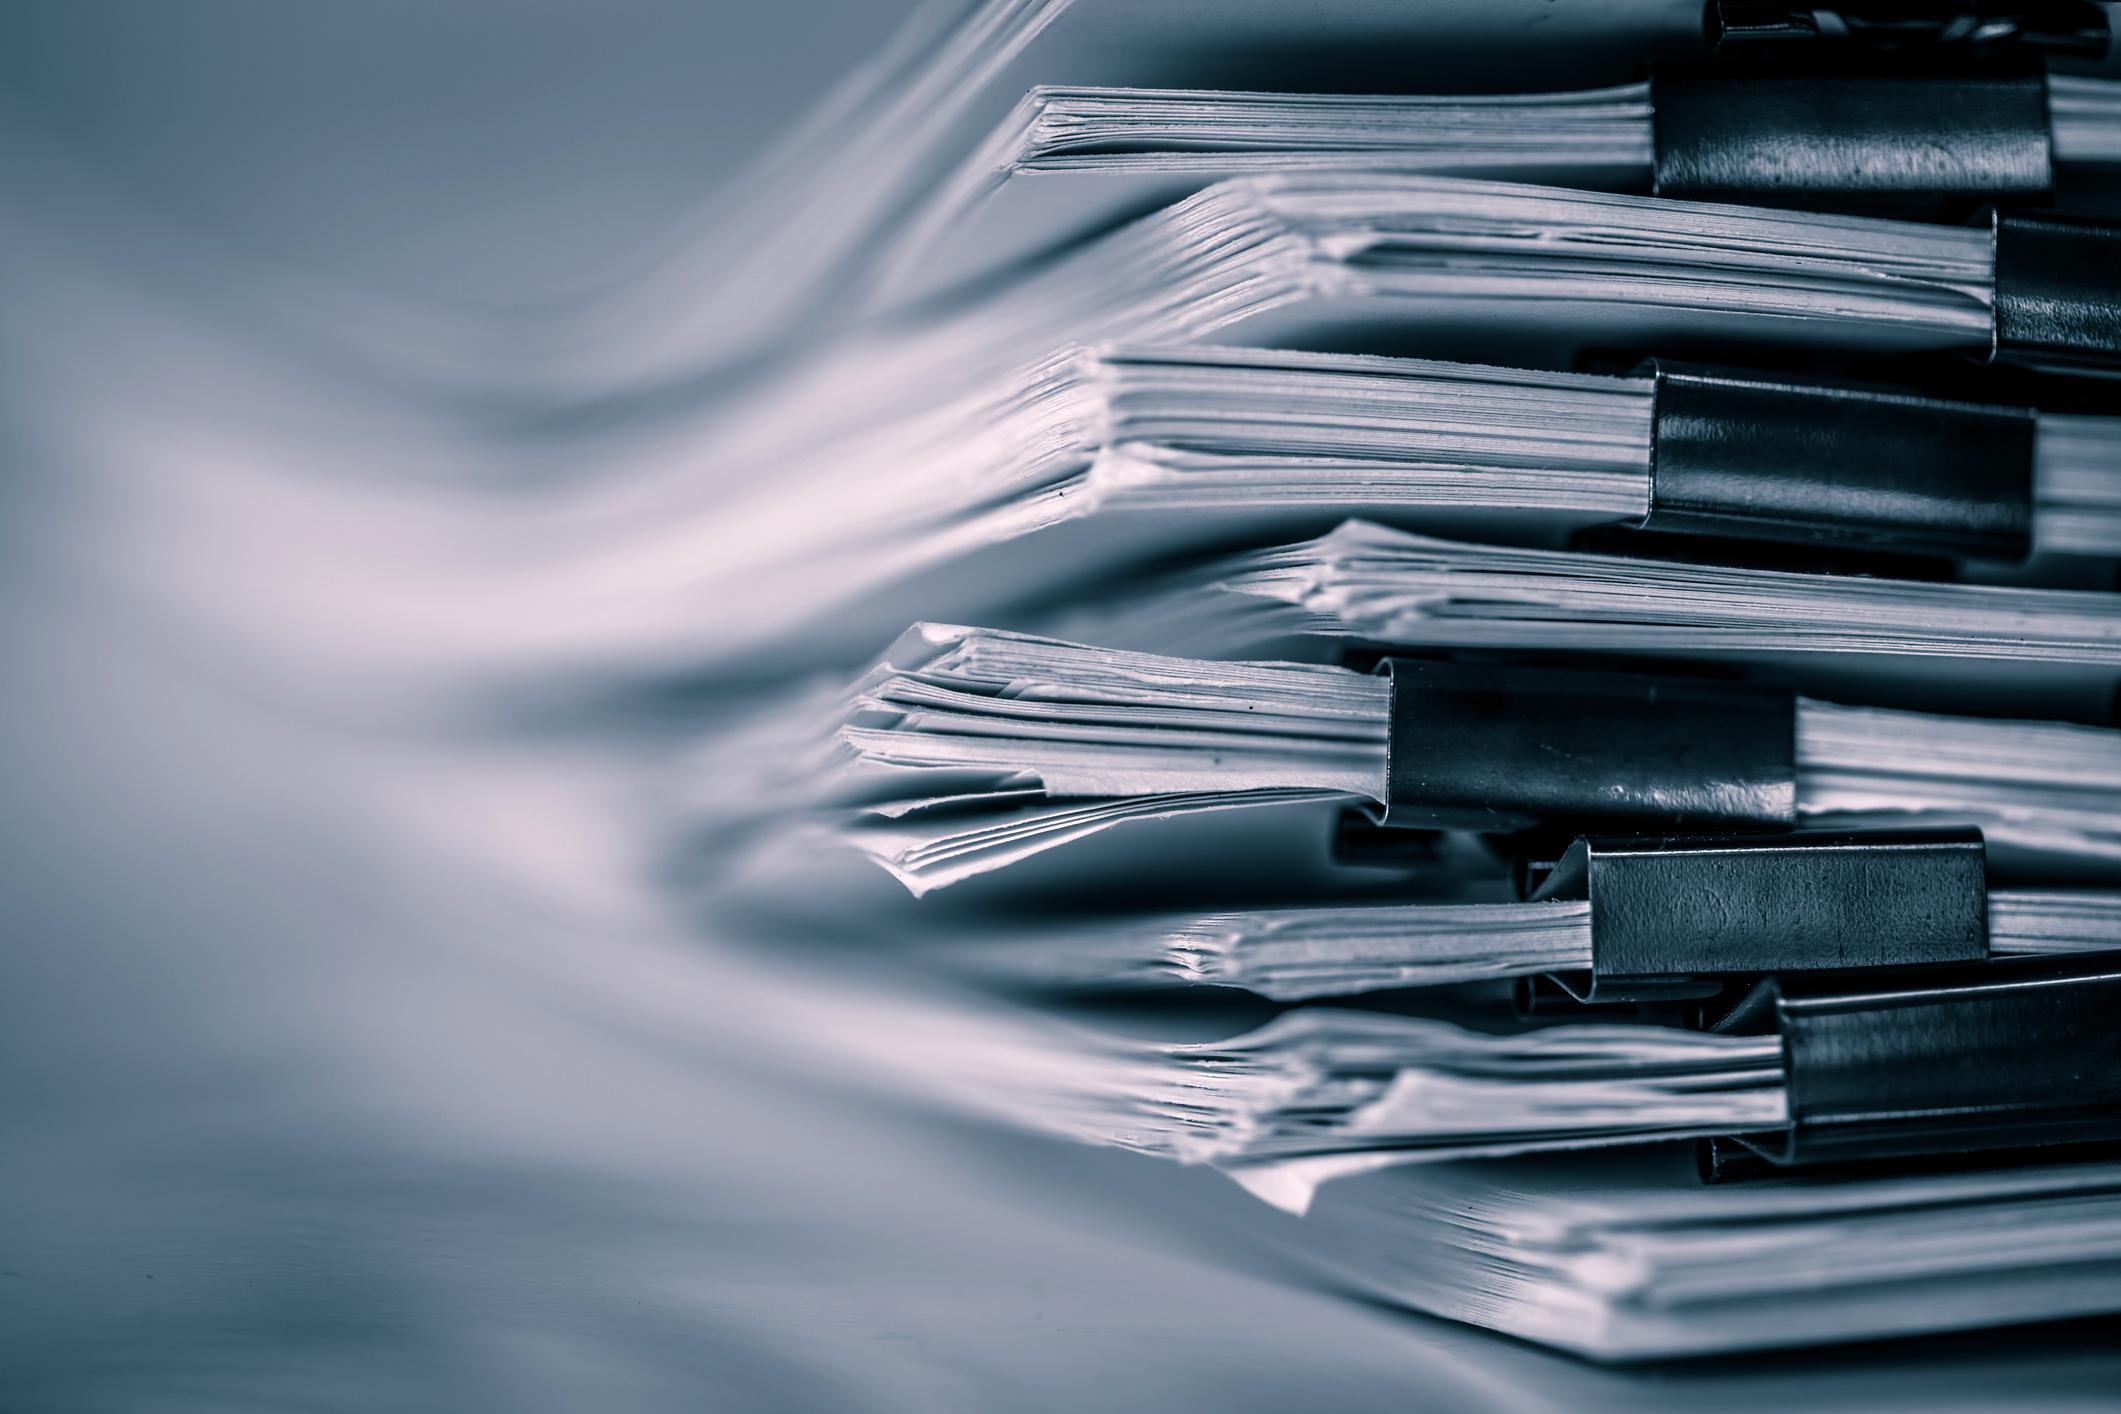 Pile of paperwork in binder clips.